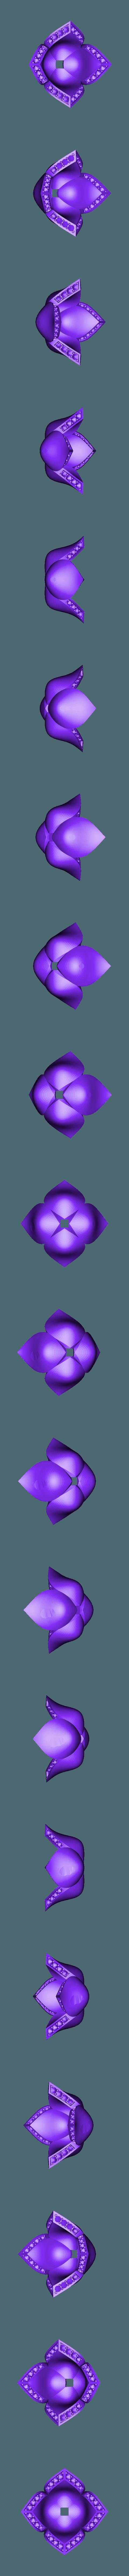 grosse tulipe ok.stl Download STL file tulip ring • 3D printing model, ToneRjewelery